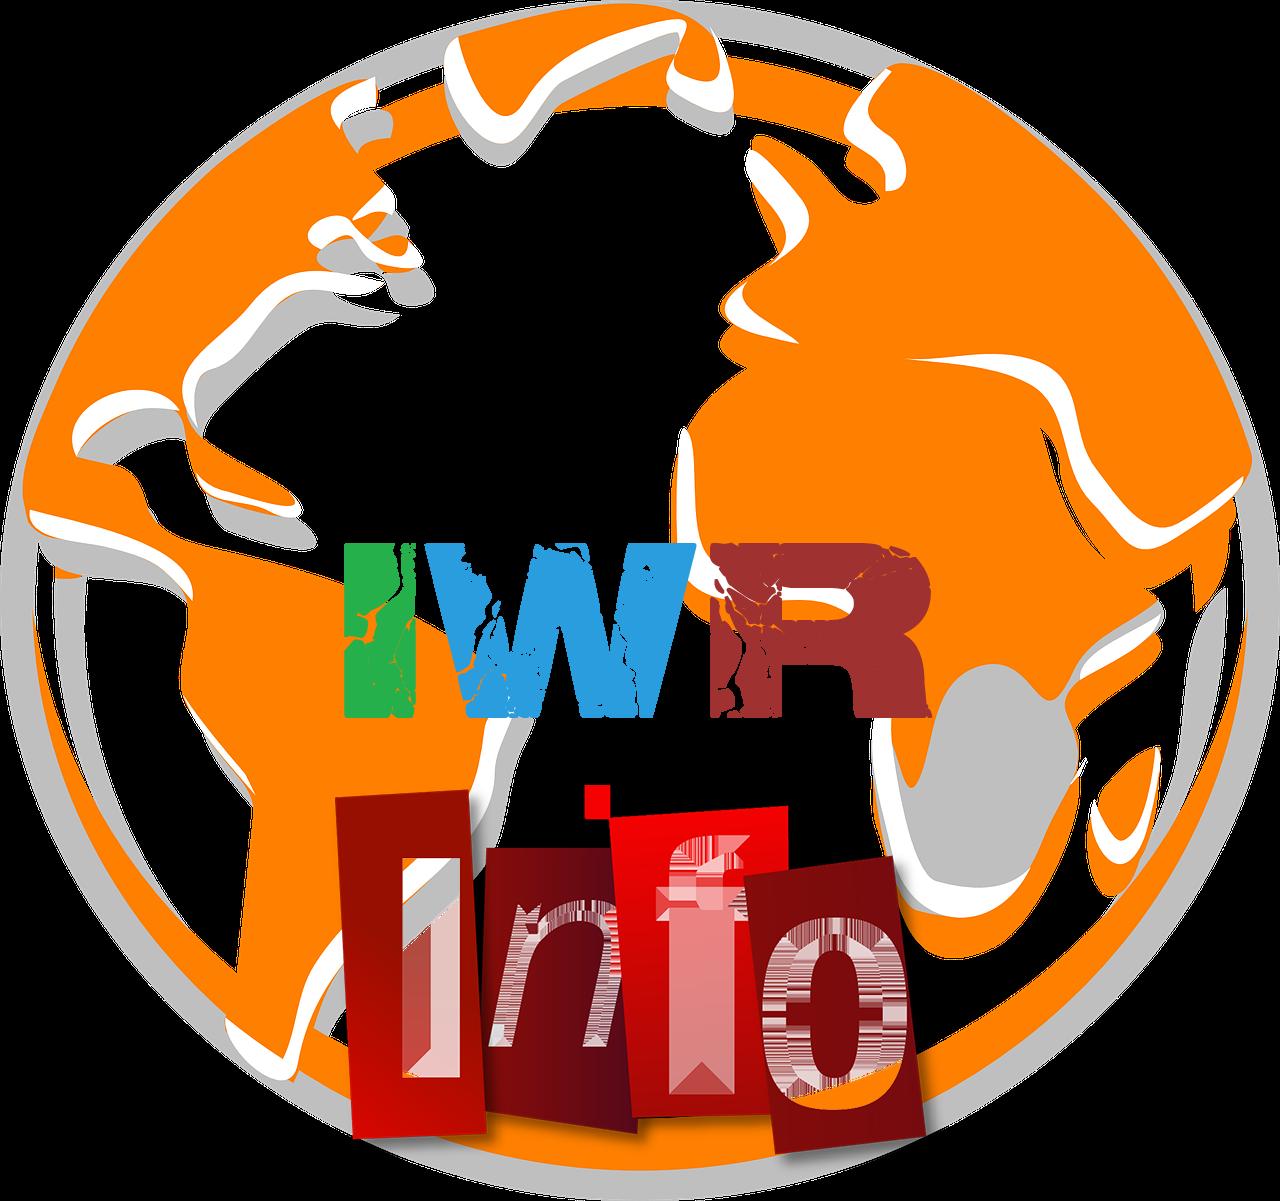 LOGO IWR info